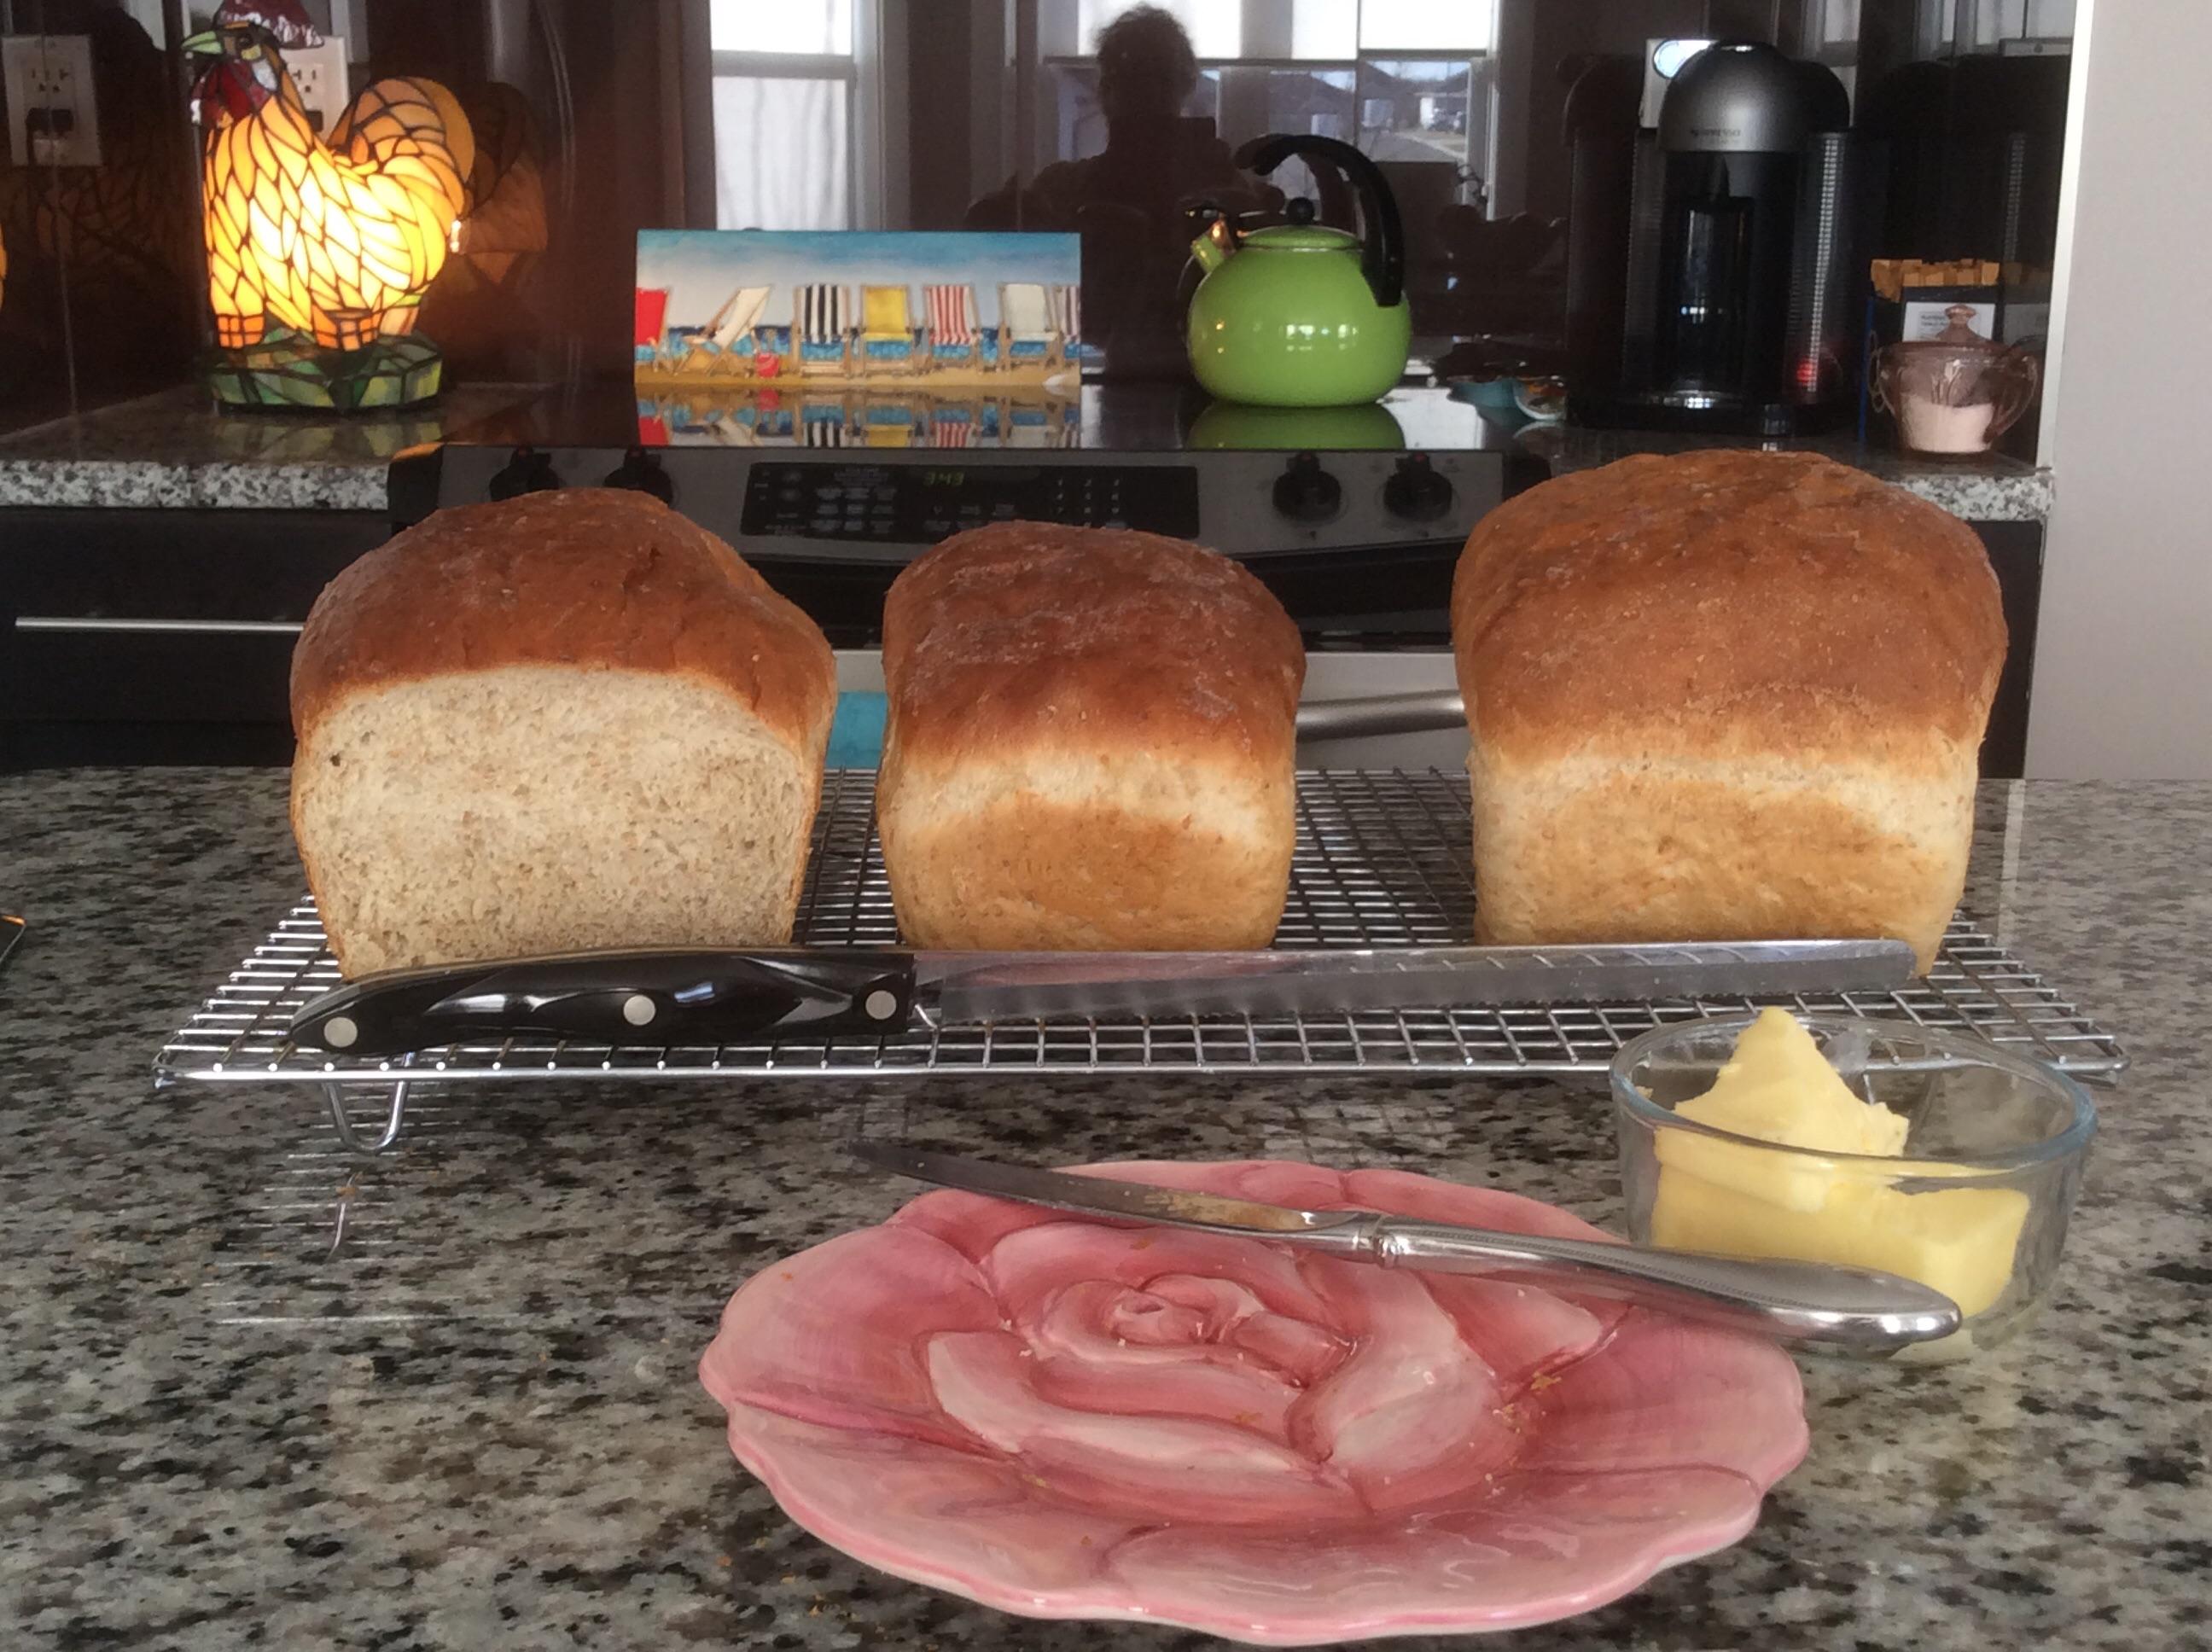 Homemade Wonderful Bread sharonjordan